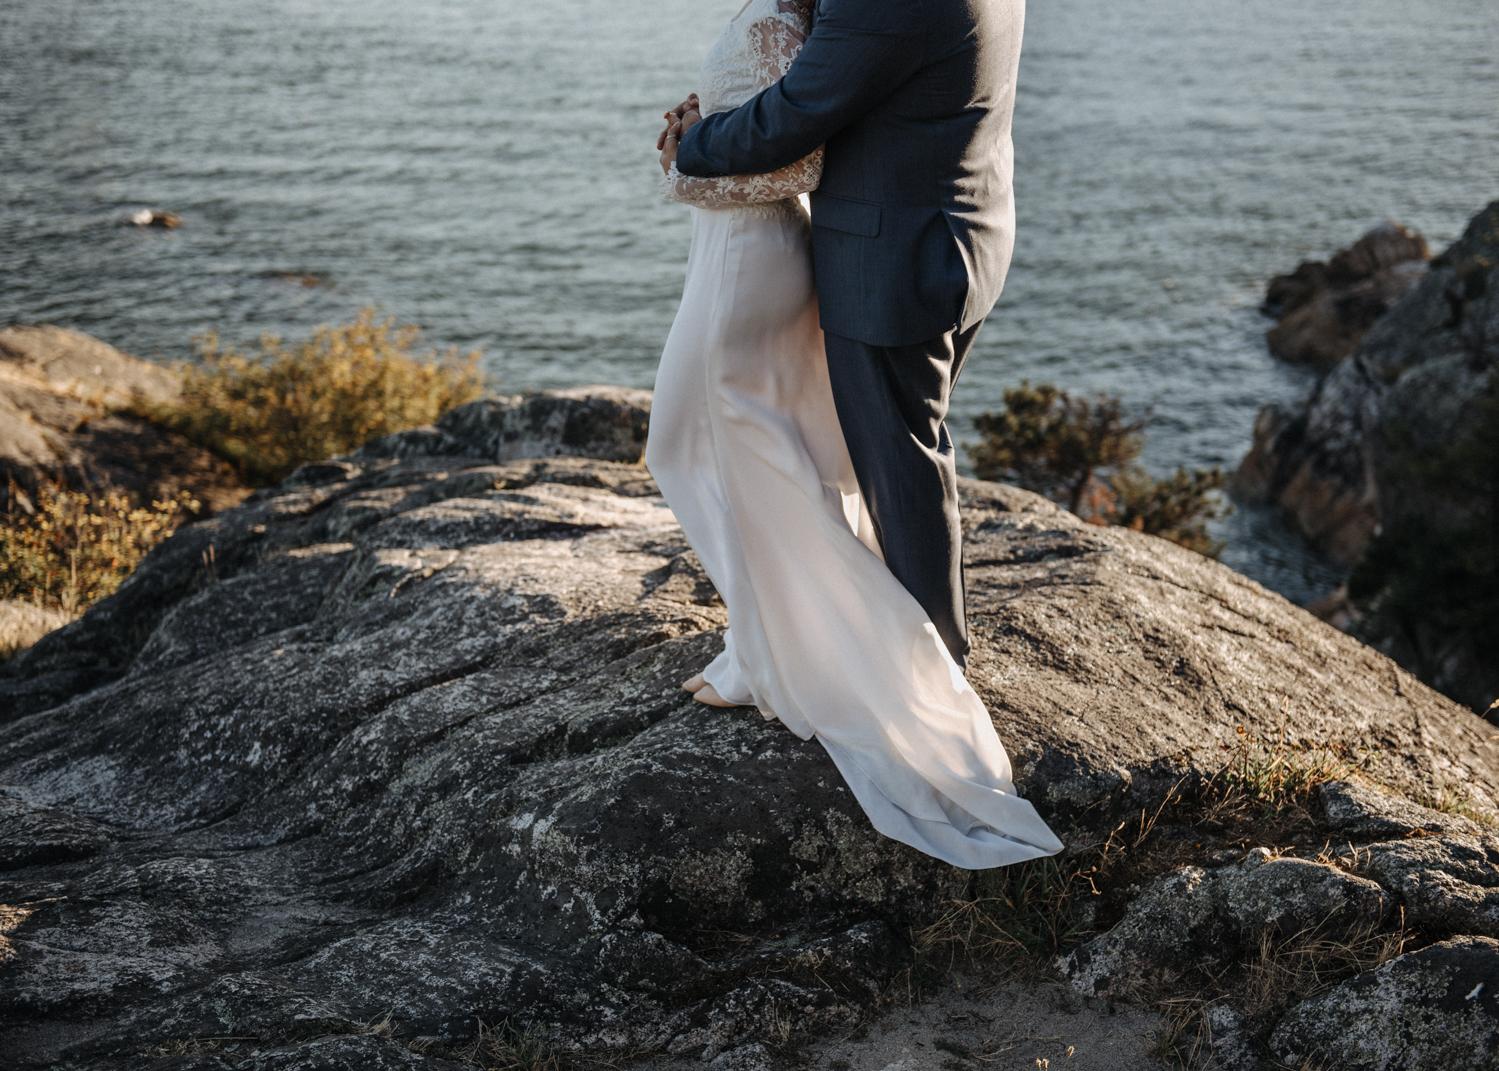 kaoverii_silva_photographer_lison_iman_wedding_websize-313.jpg